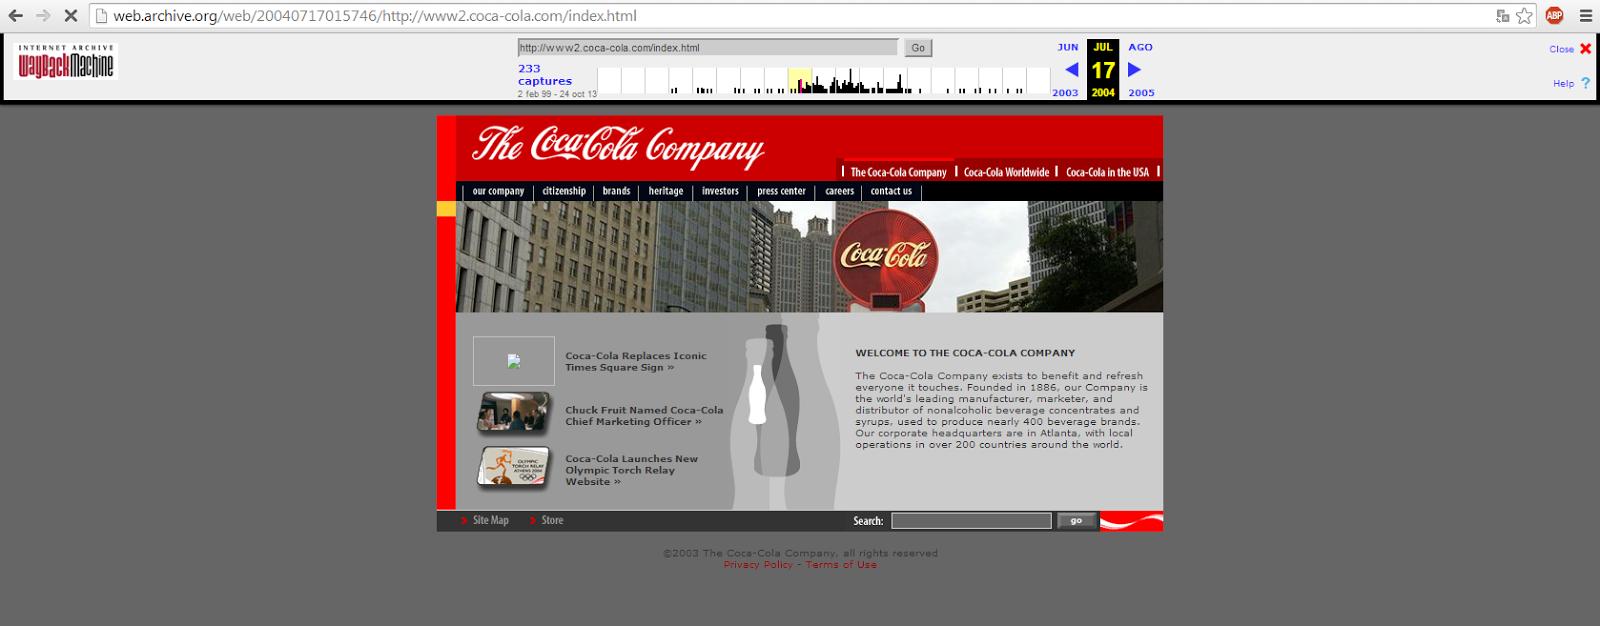 web de coca-cola 2004